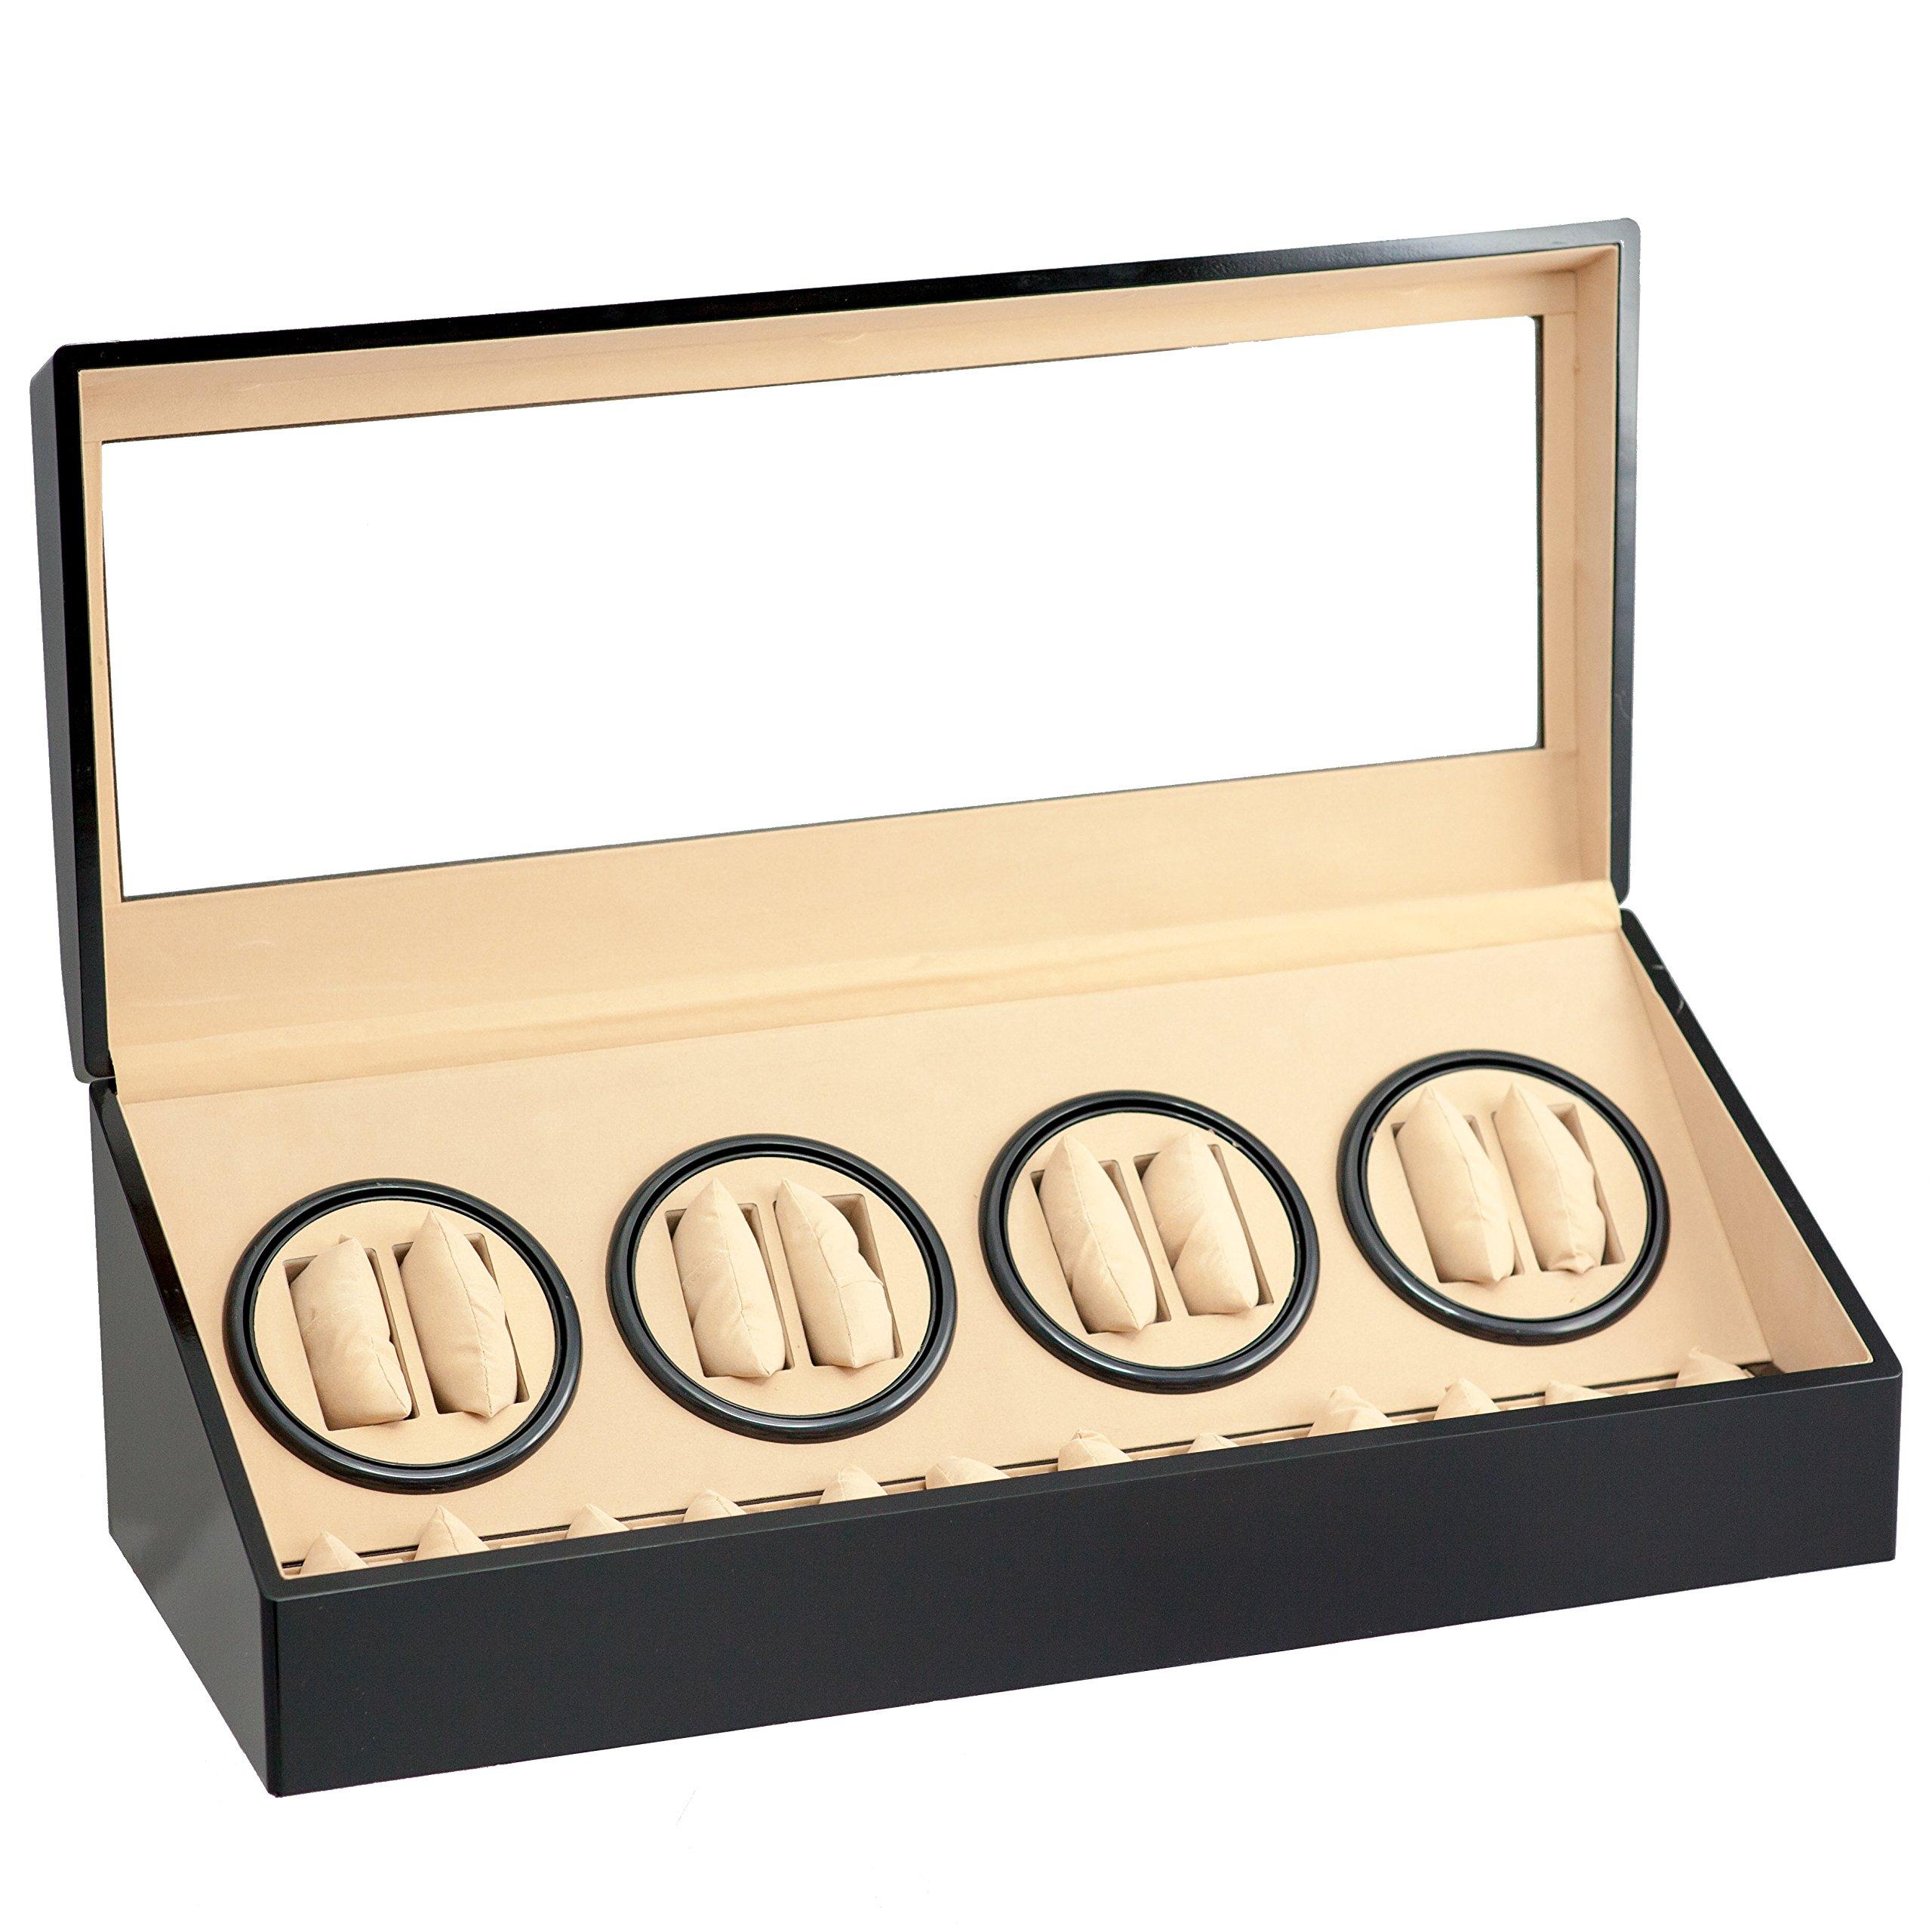 Brand New 8+12 Automatic Rotation Black Wood Quad Watch Winder Storage Display Case Box Organizers by WatchBuddy